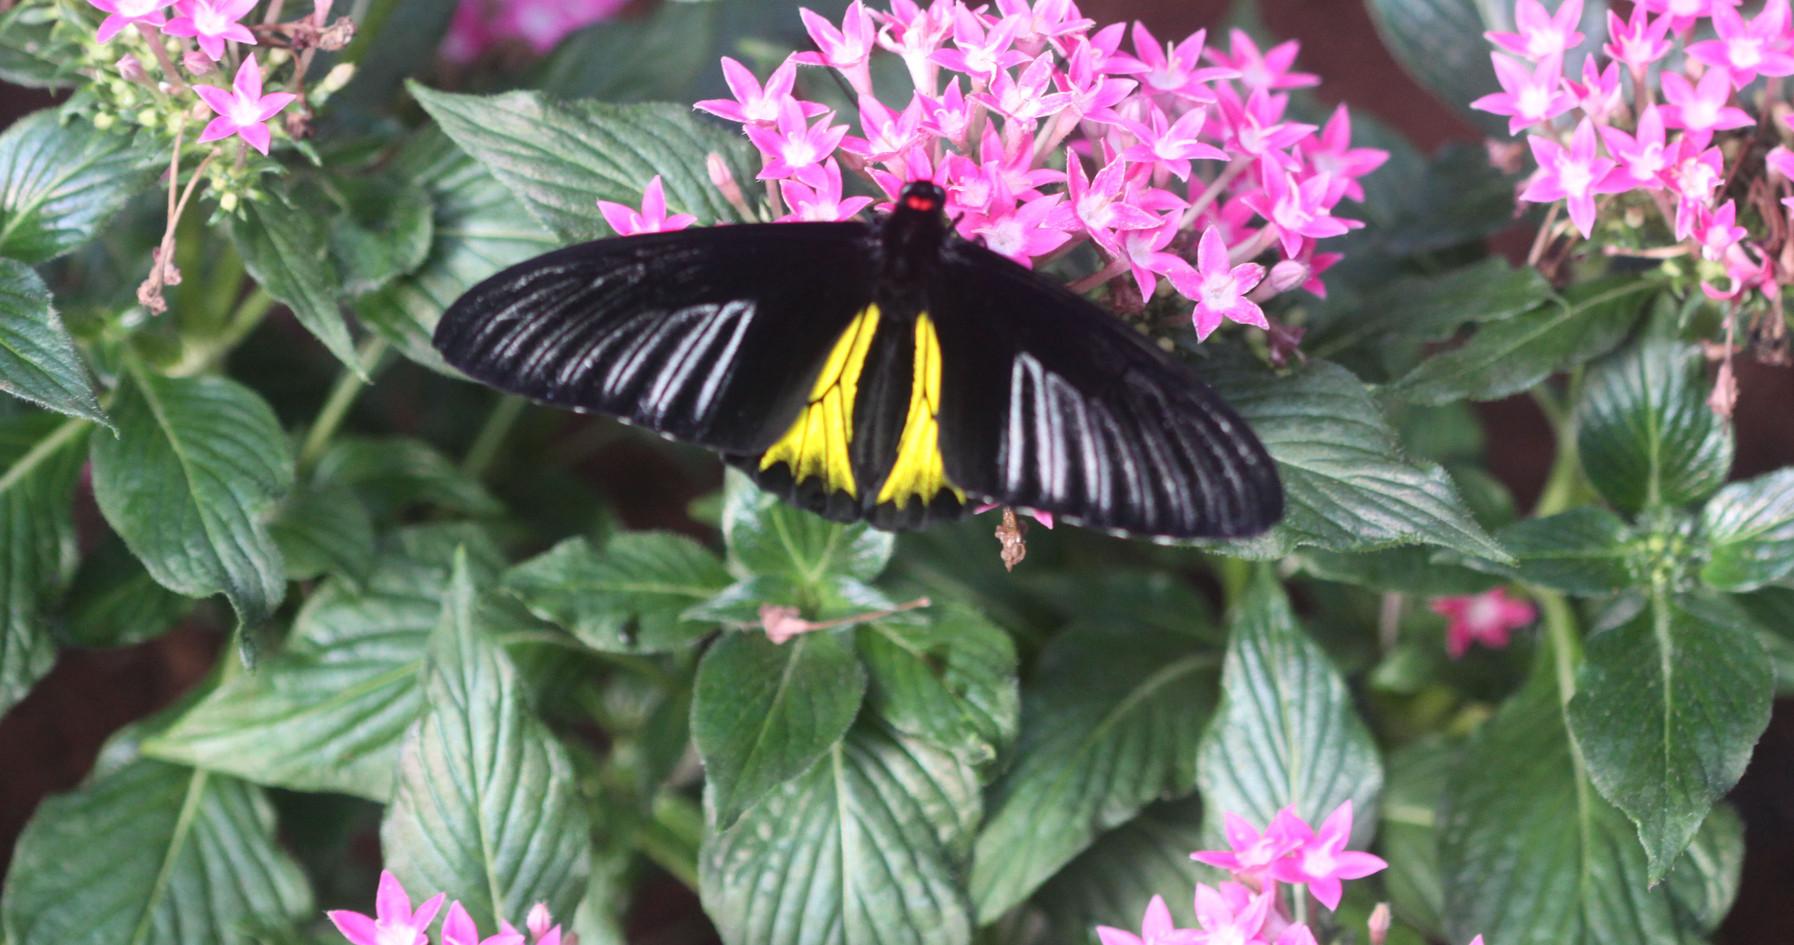 A Common Birdwing (Dorsal side)